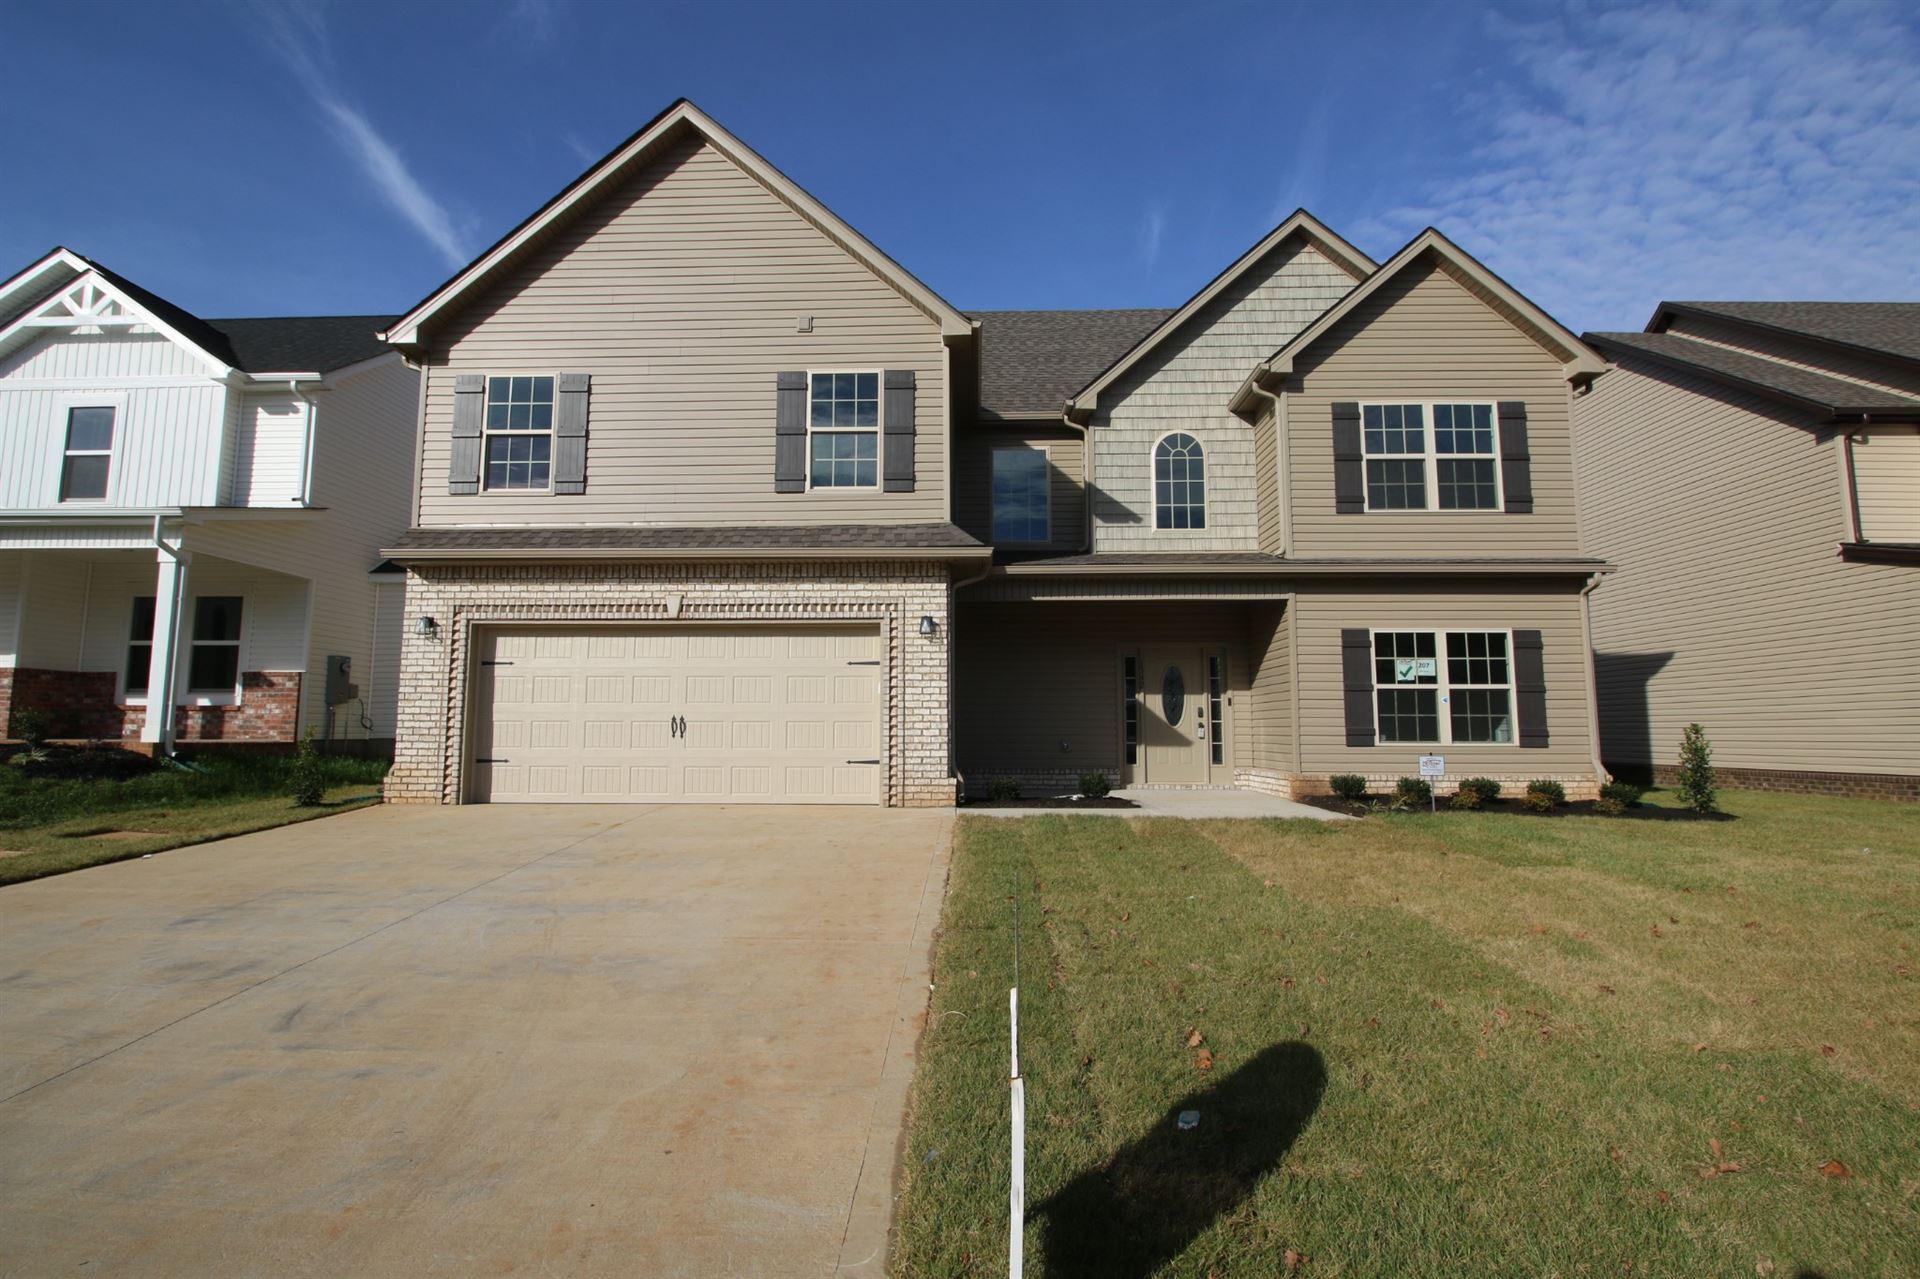 207 Mills Creek, Clarksville, TN 37042 - MLS#: 2285020